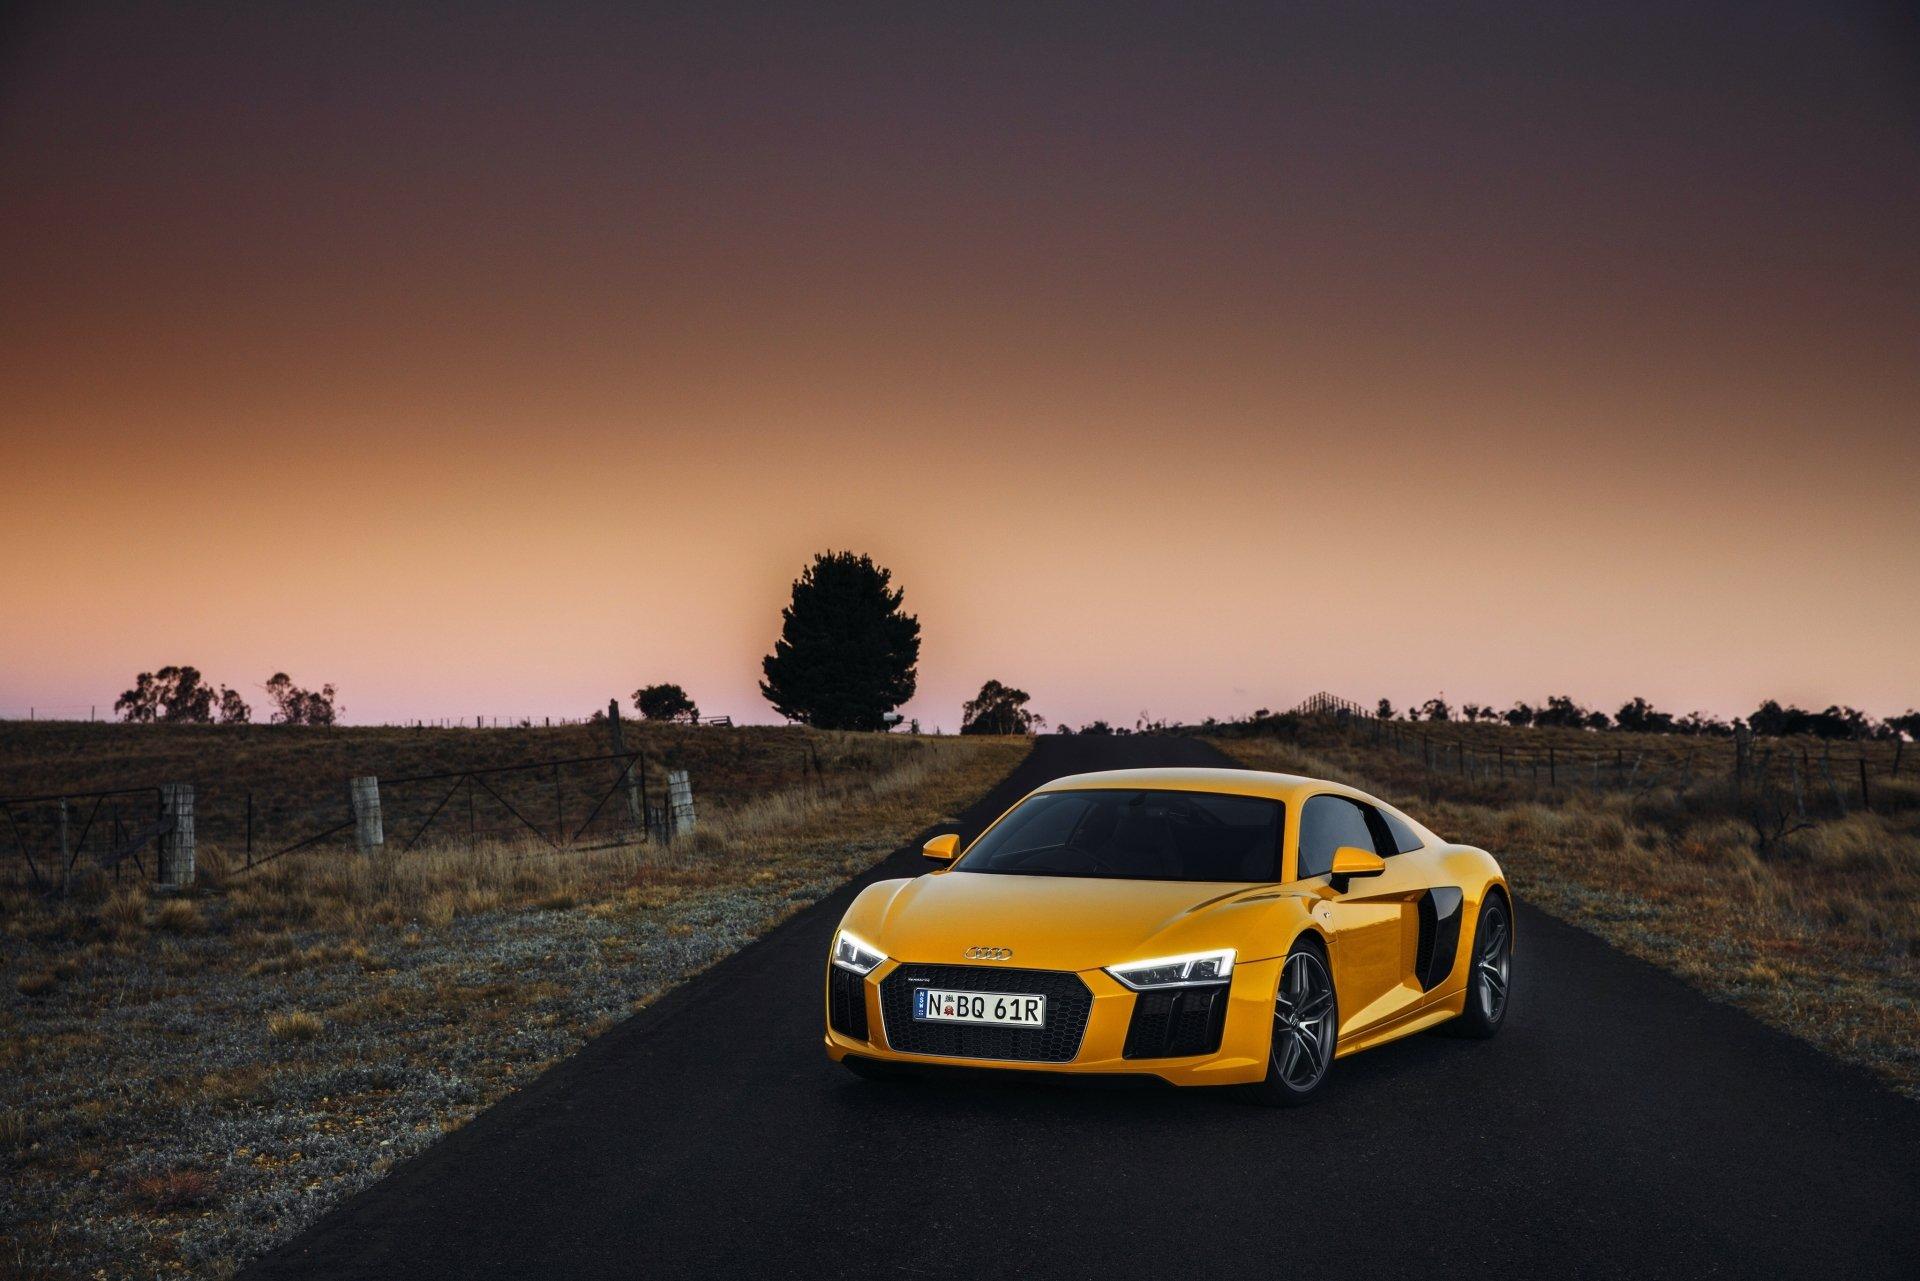 Vehicles - Audi R8  Audi R8 V10 Audi Yellow Car Car Vehicle Sport Car Supercar Wallpaper